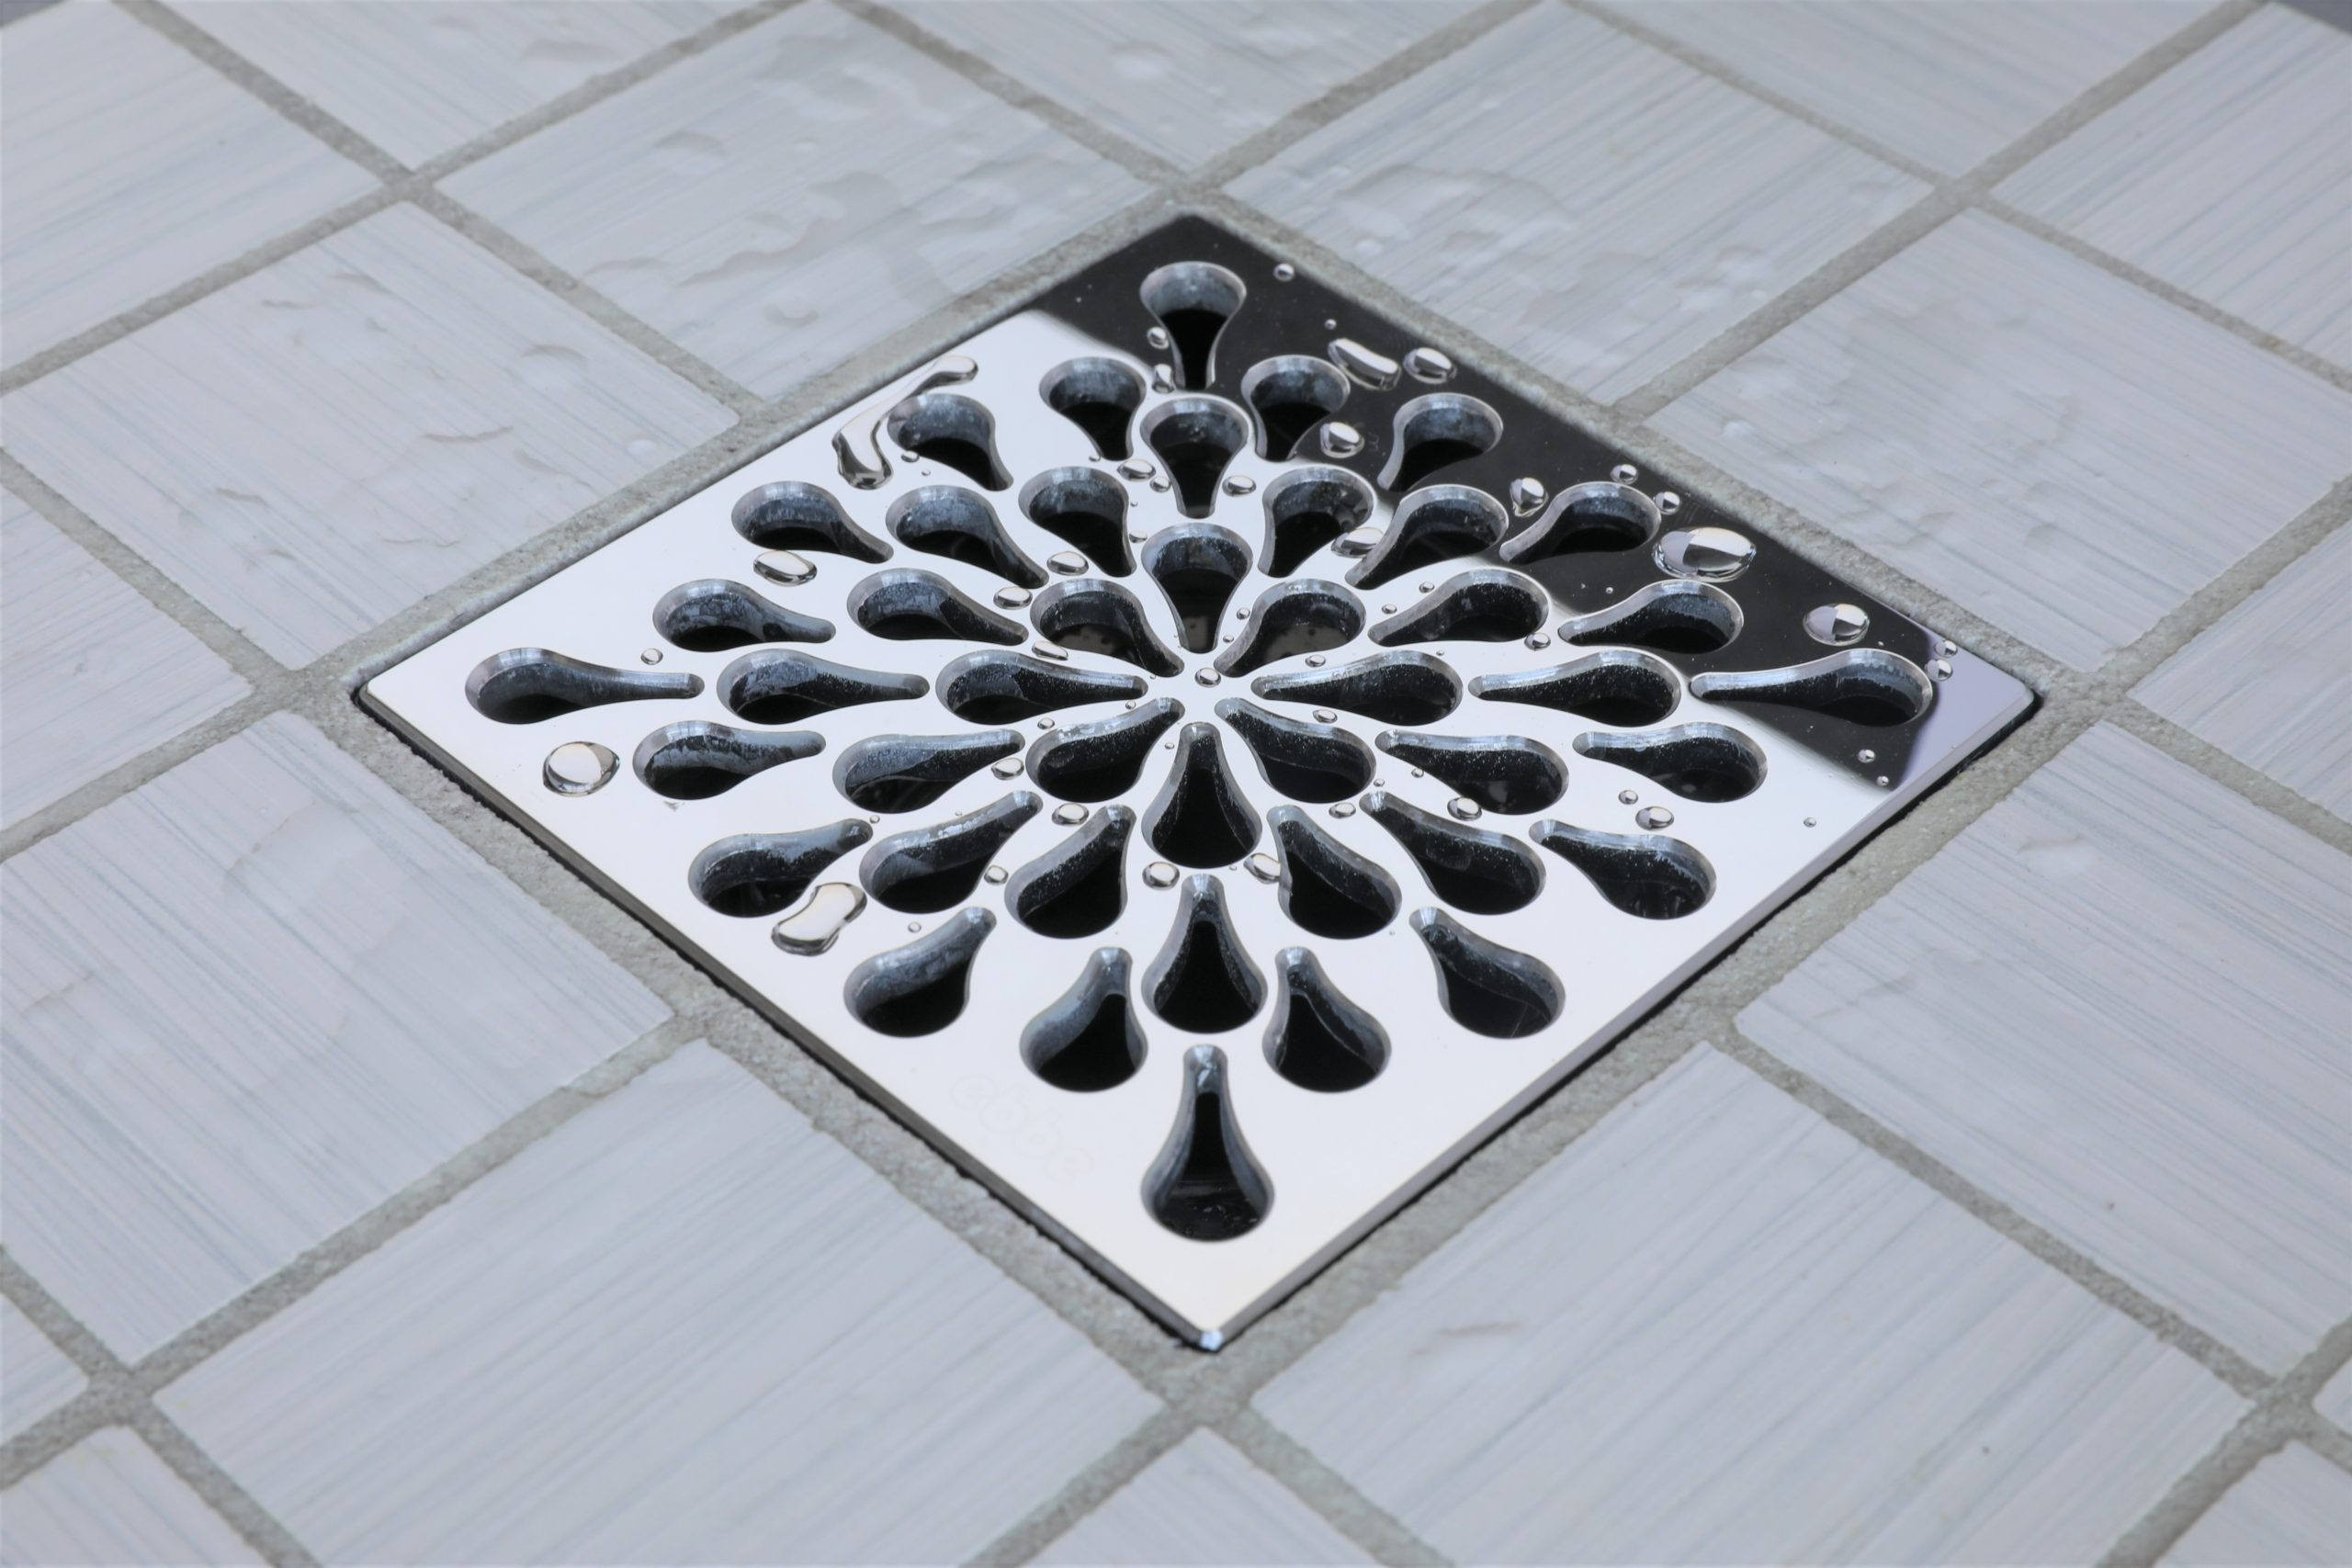 E4805-PS - Ebbe UNIQUE Drain Cover - SPLASH - Polished Stainless Steel - Shower Drain - e